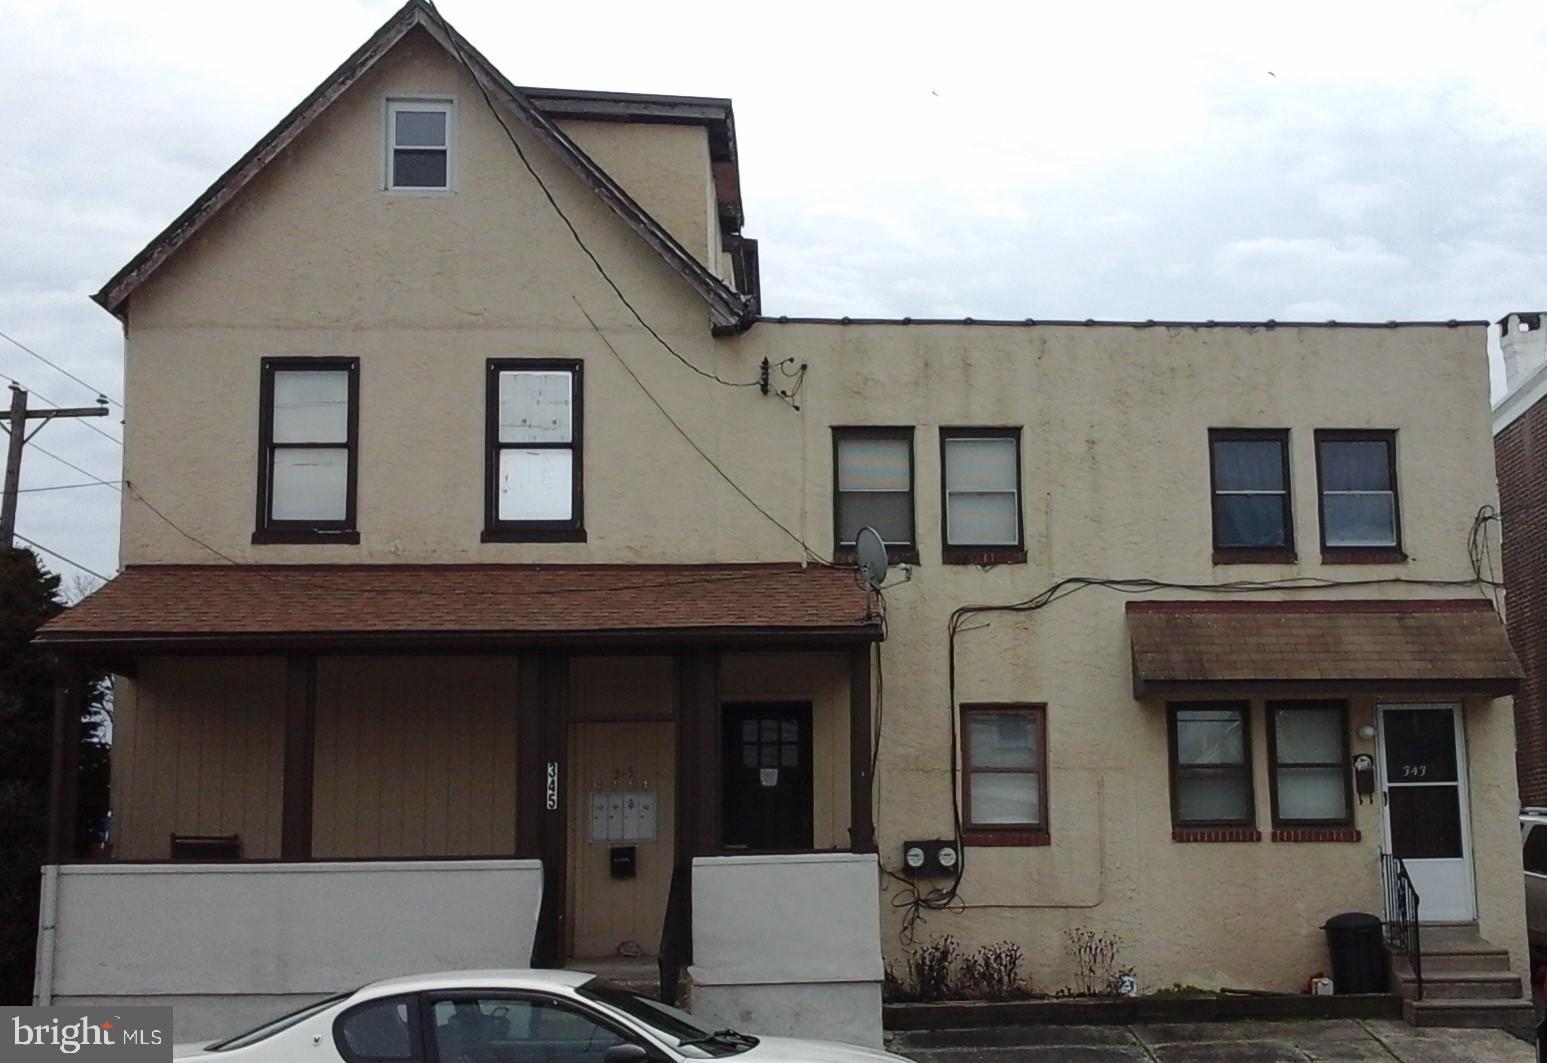 343 SENECA STREET, ESSINGTON, PA 19029